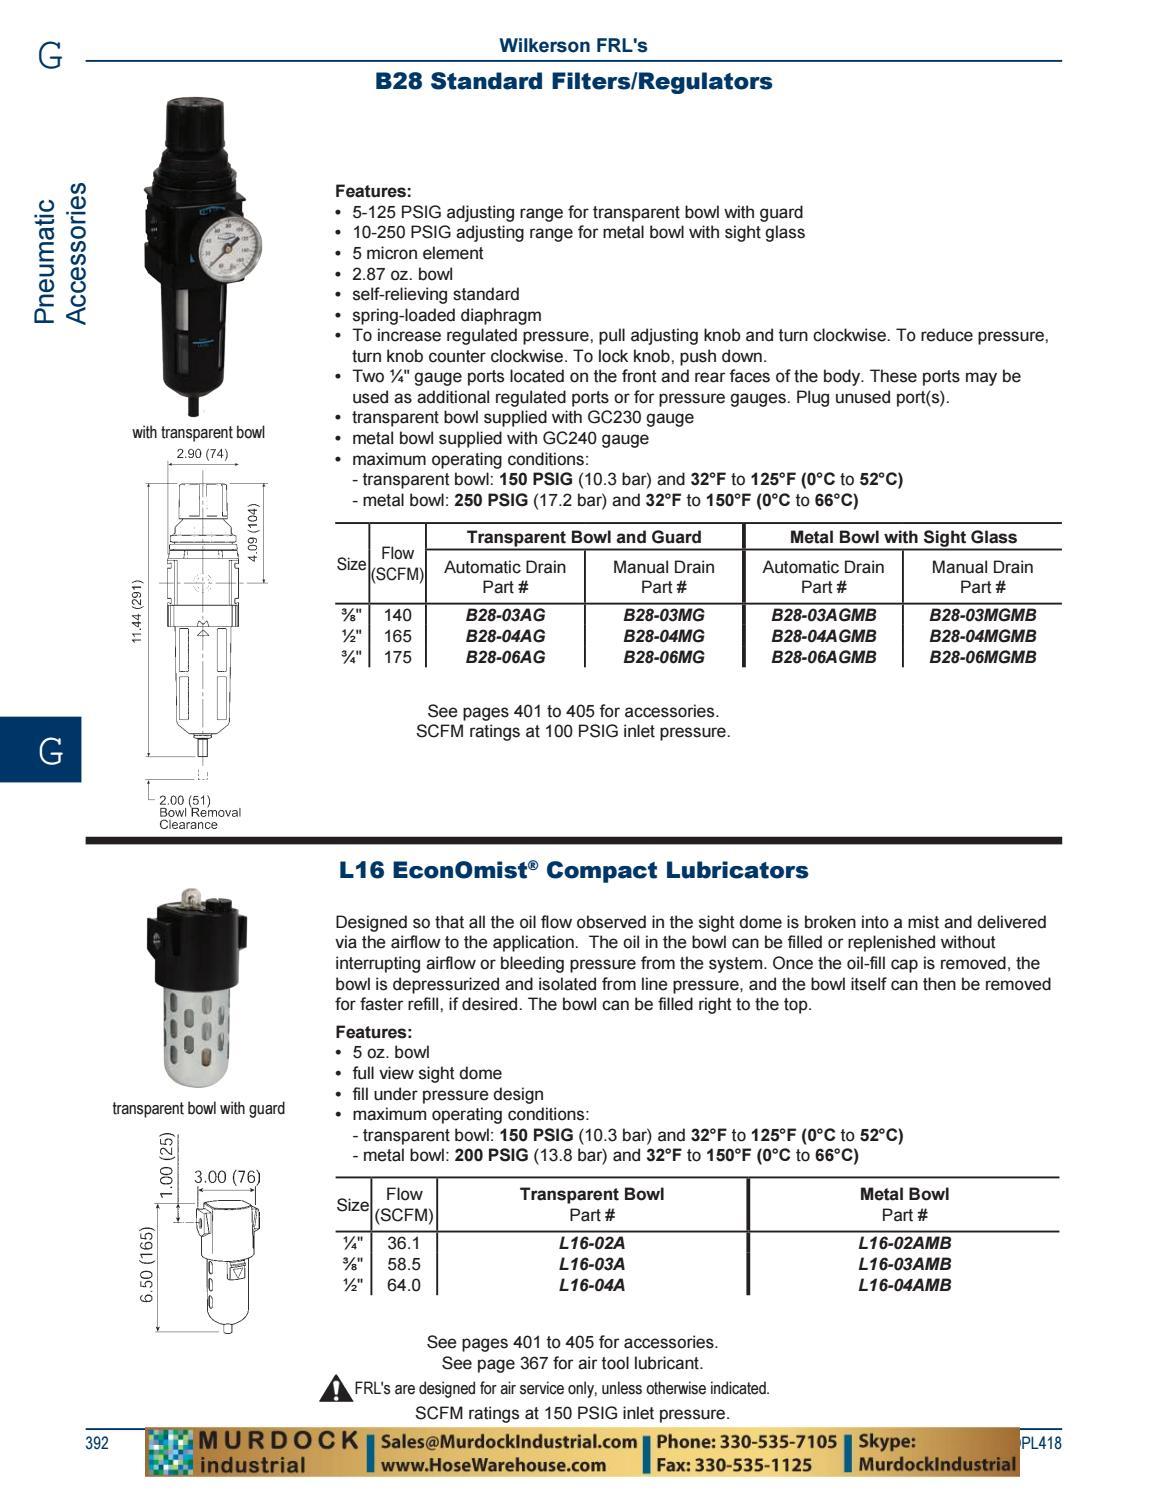 3//4 Size 150 psig Pressure 3//4 Size Dixon Valve /& Coupling Dixon B28-06MG Manual Drain Wilkerson Standard Filter//Regulator with Transparent Bowl and Guard 175 SCFM Flow